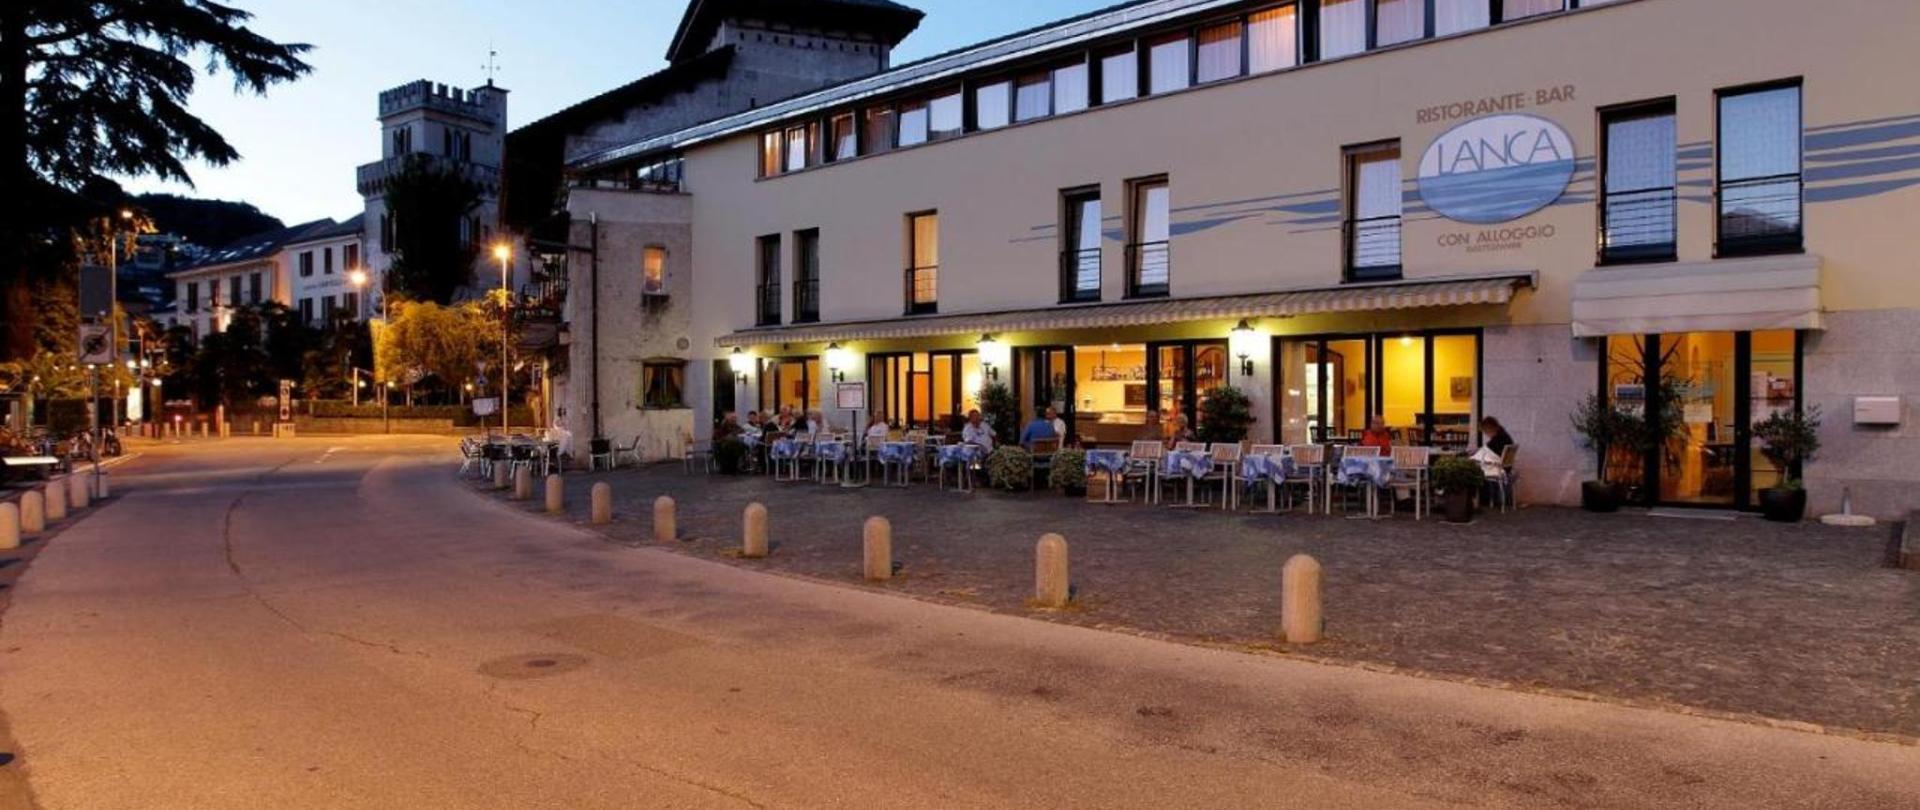 Hotell Ristorante Lanca